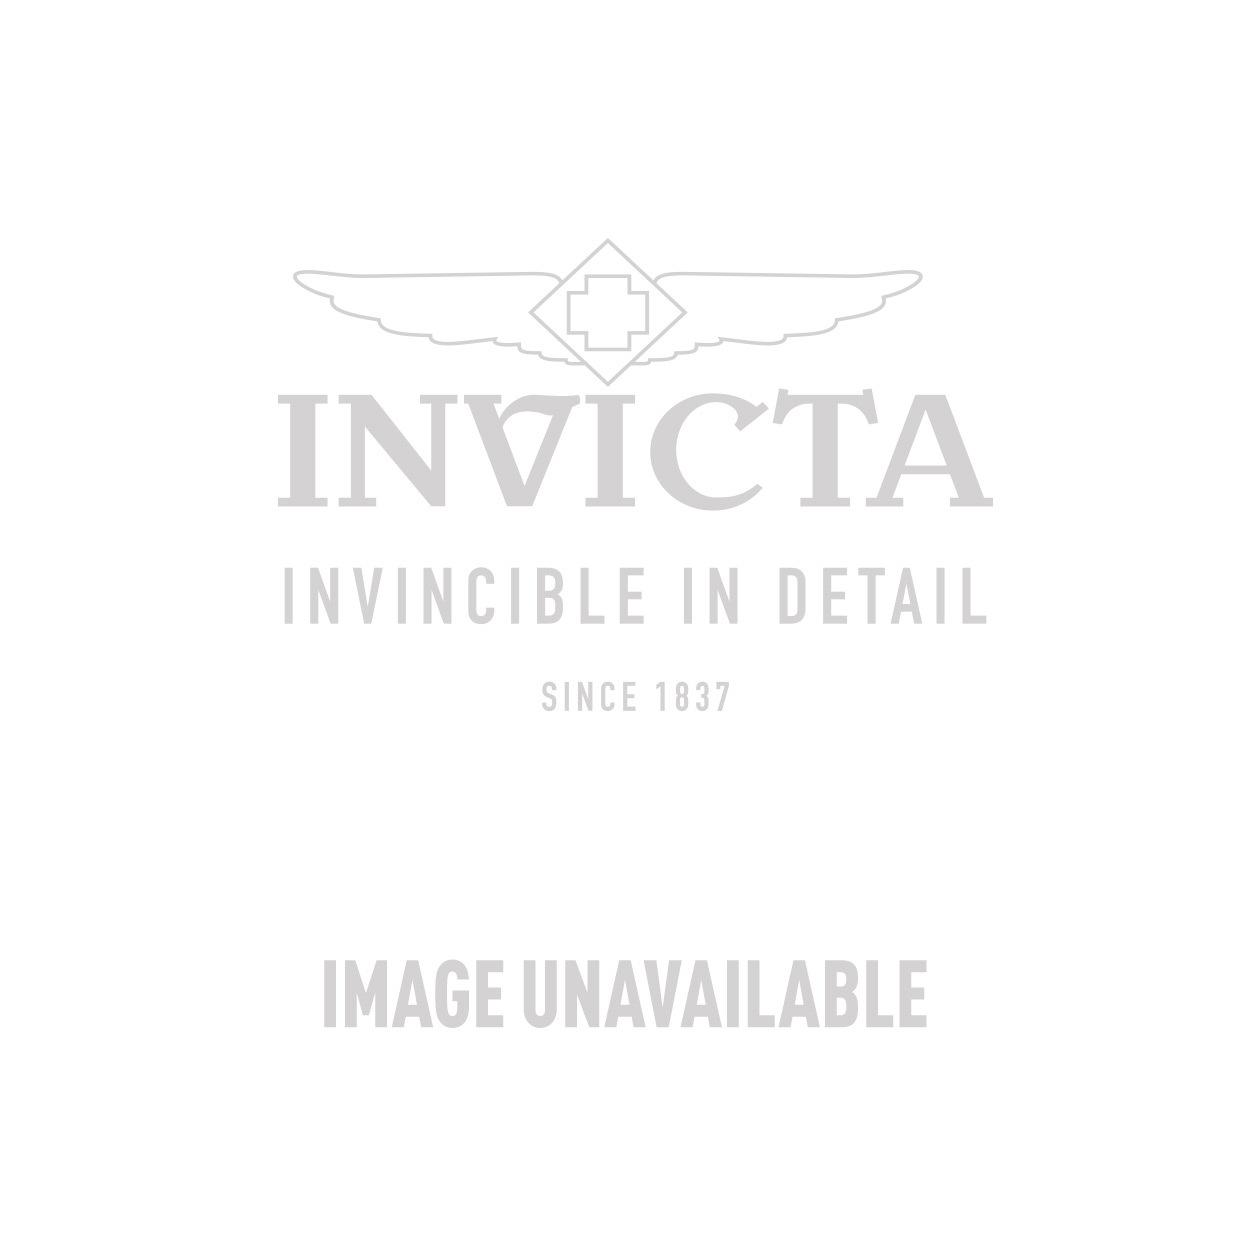 eece482e3 Invicta Pro Diver Mens Quartz 50mm Stainless Steel Case Blue Dial ...